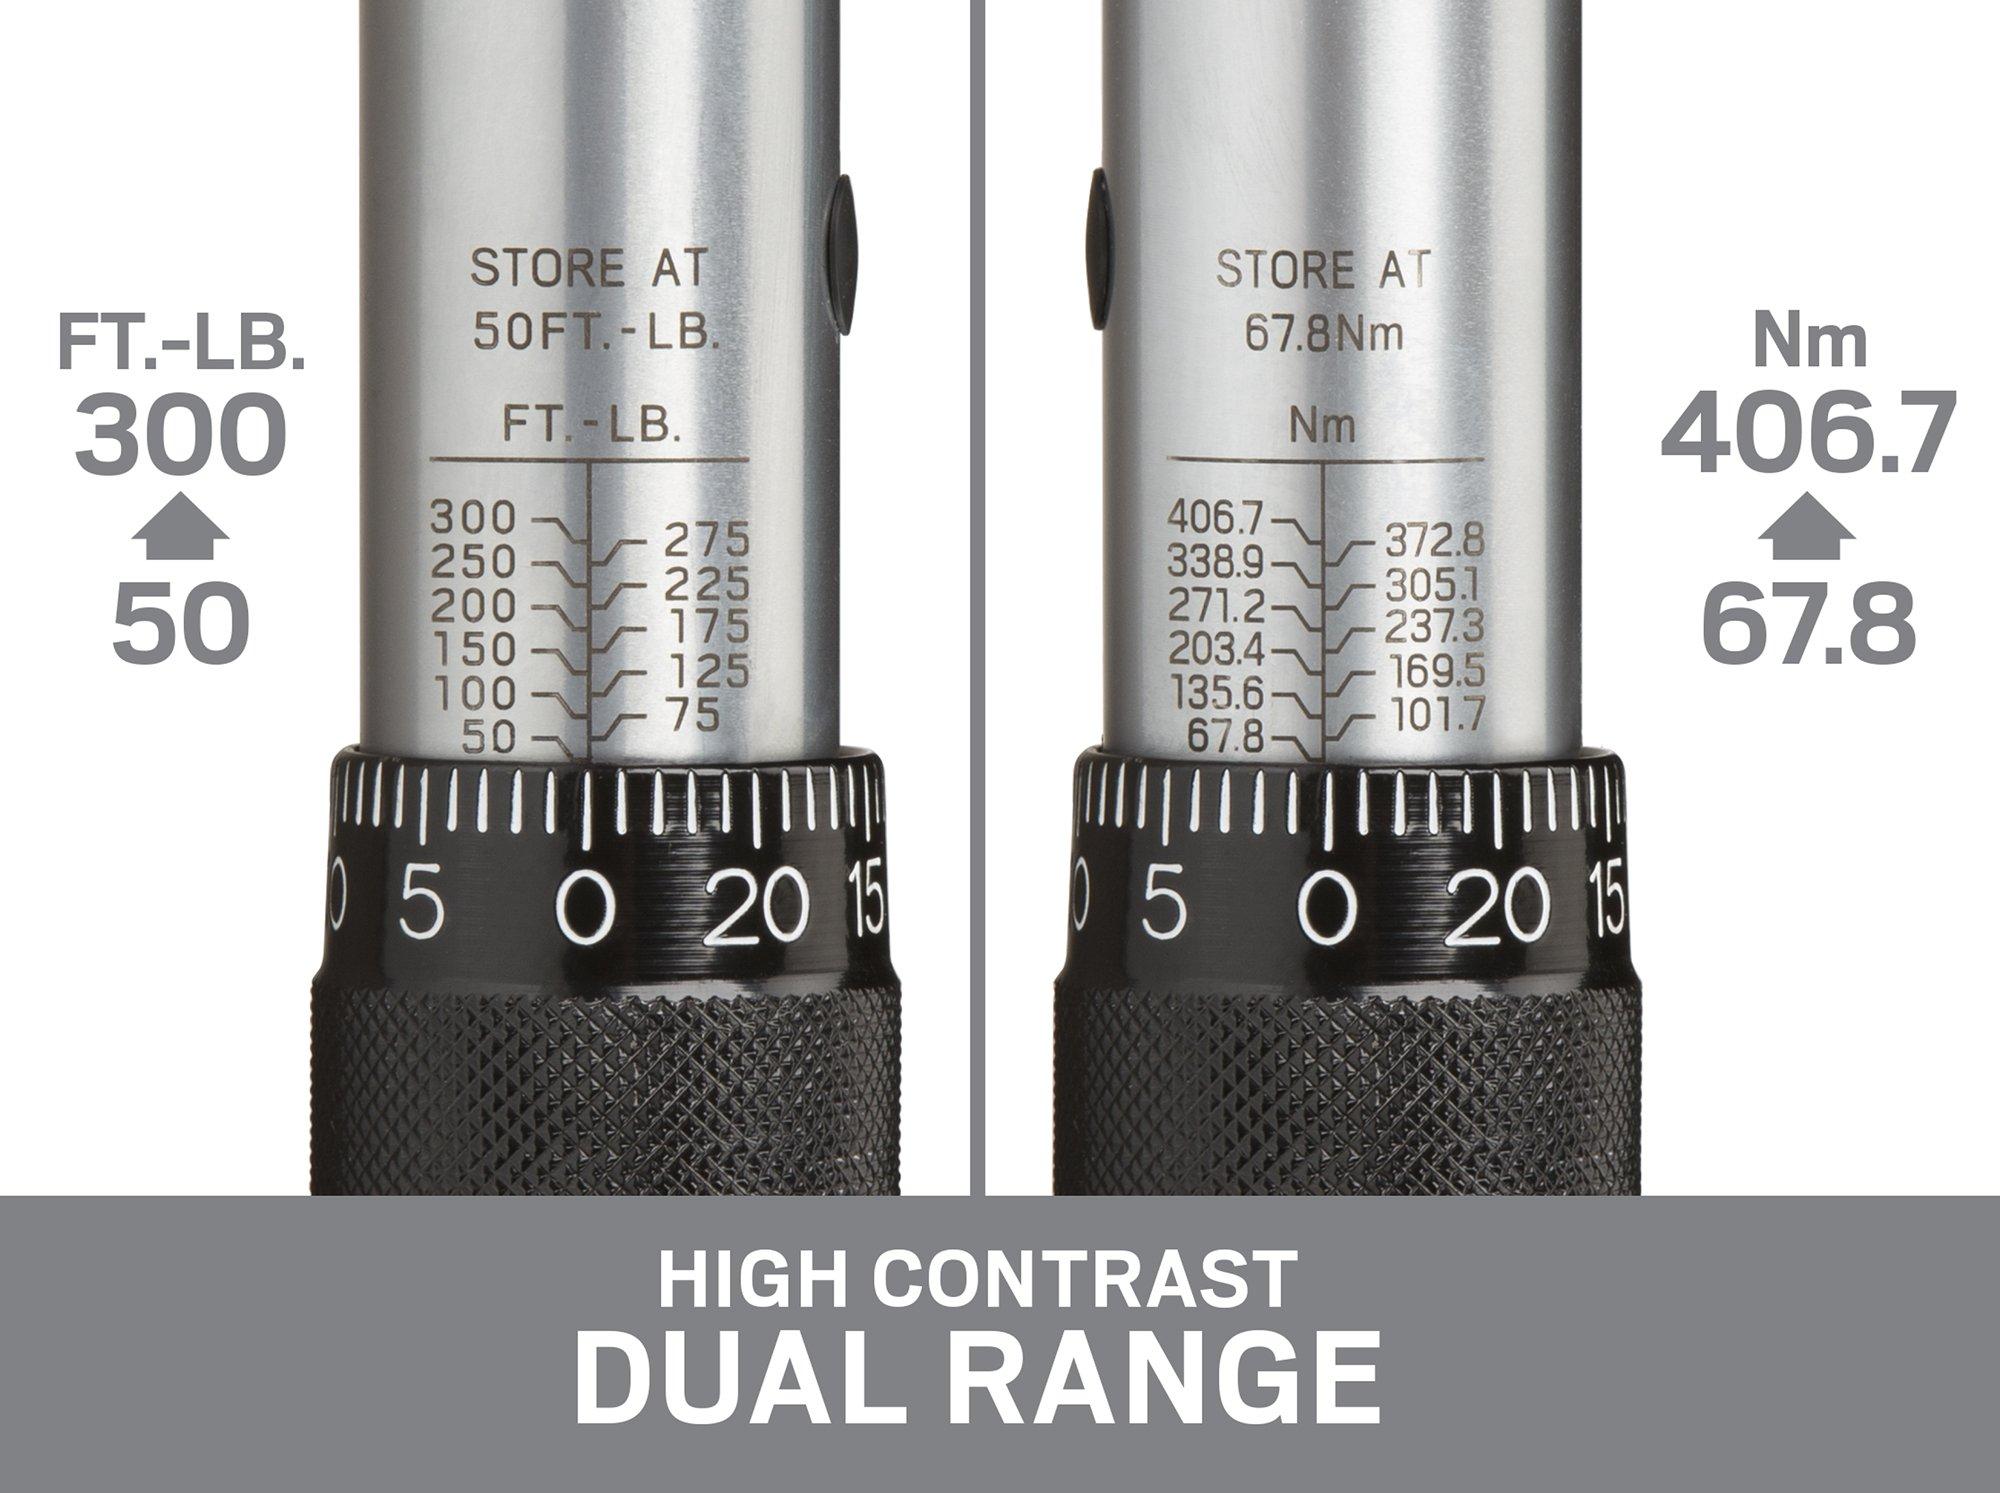 TEKTON 24350 3/4-Inch Drive Click Torque Wrench (50-300 ft.-lb./67.8-406.7 Nm) by TEKTON (Image #5)